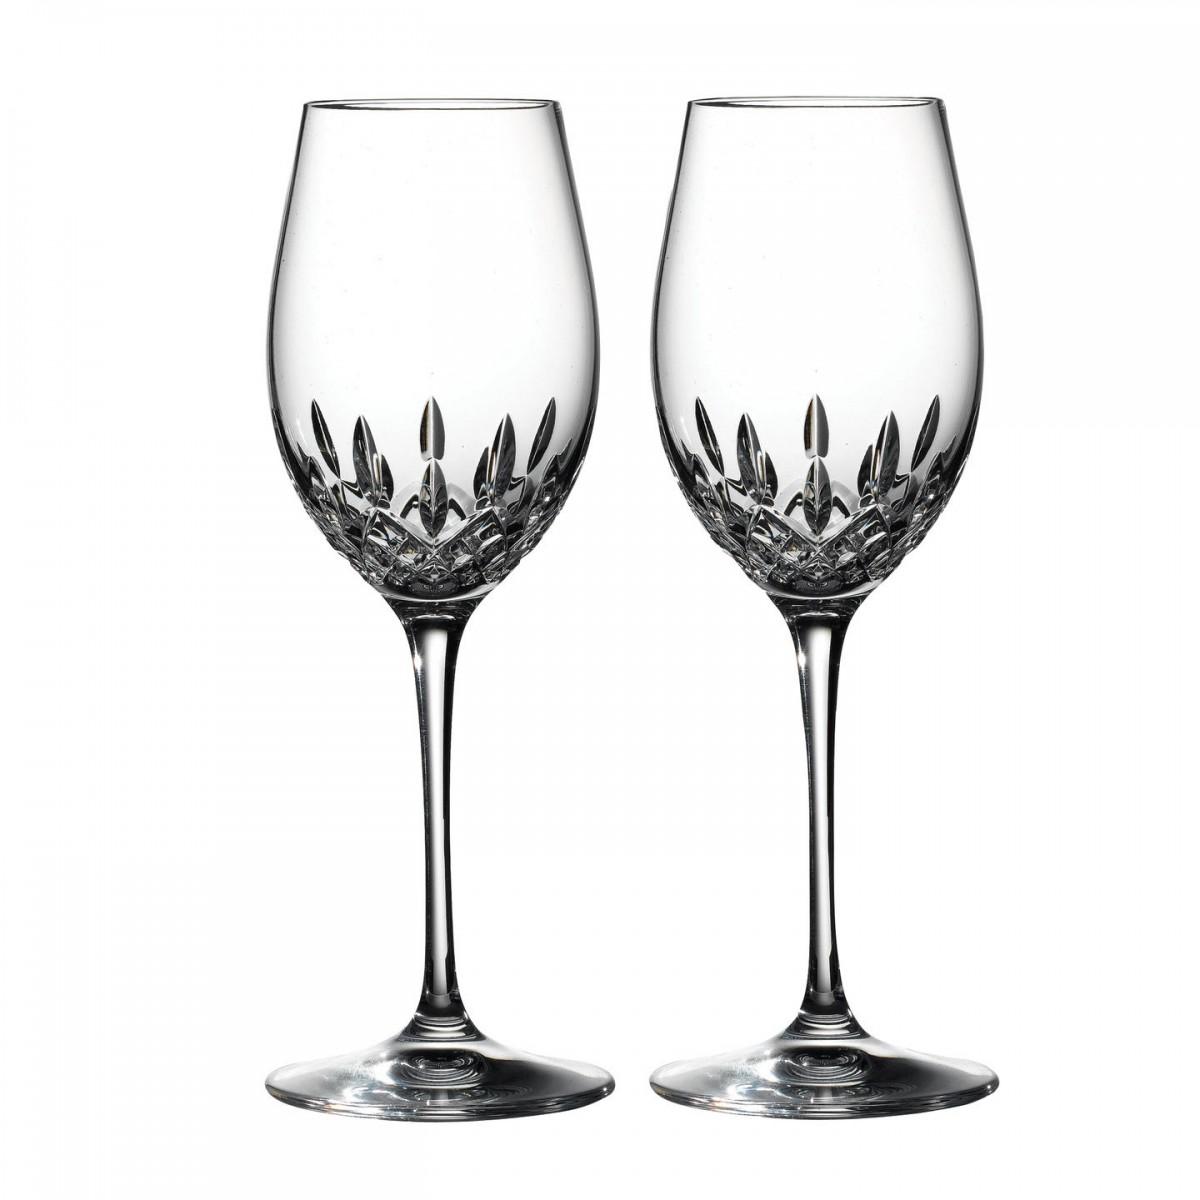 waterford-lismore-essence-white-wine-glass-024258421875.jpg